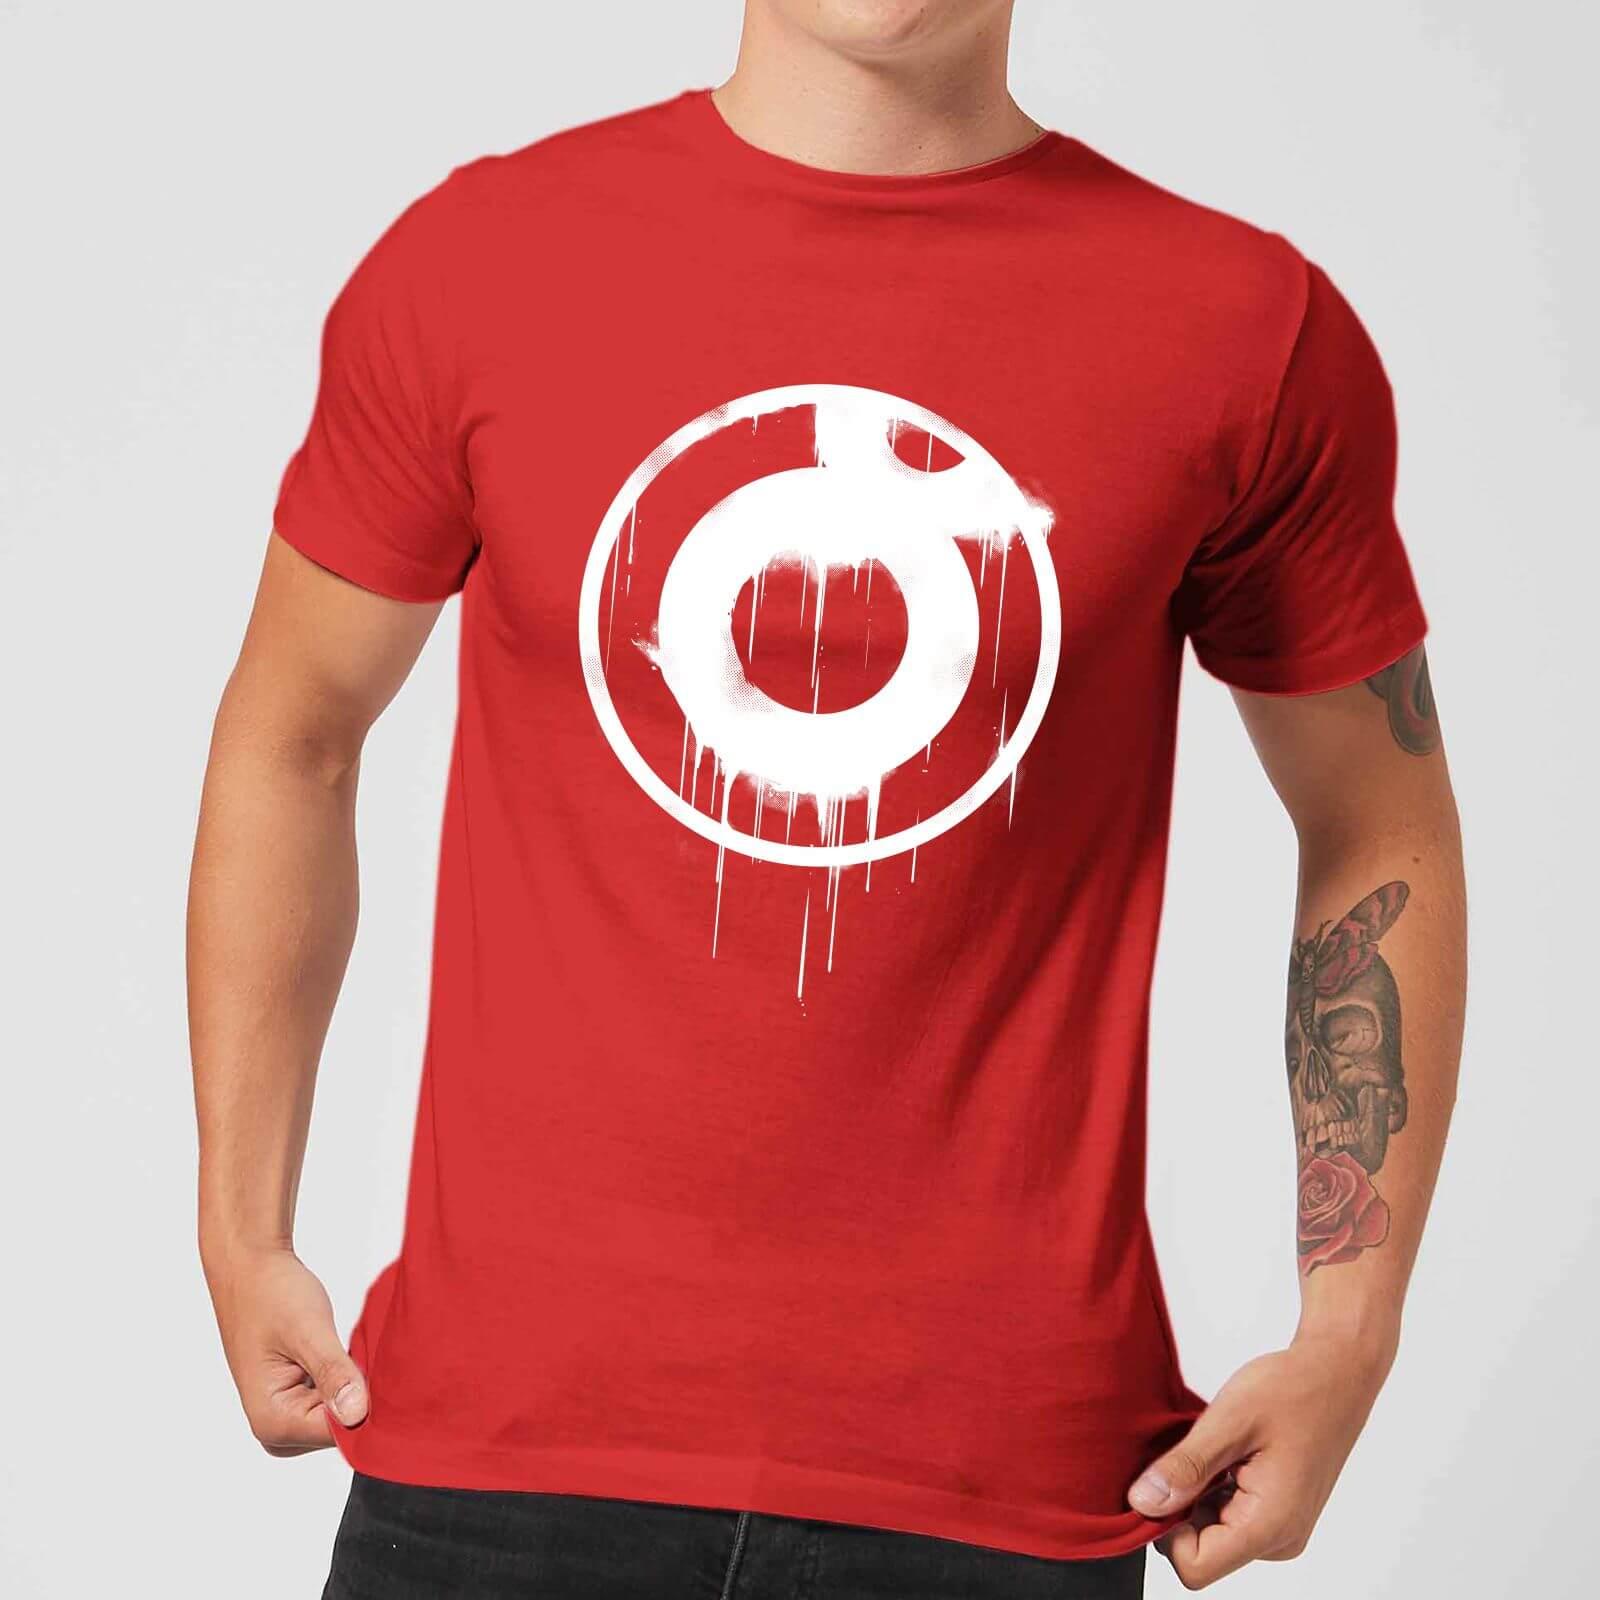 8199b5f1 Ei8htball Spray Paint Logo White Print Men's T-Shirt - Red Merchandise |  Zavvi